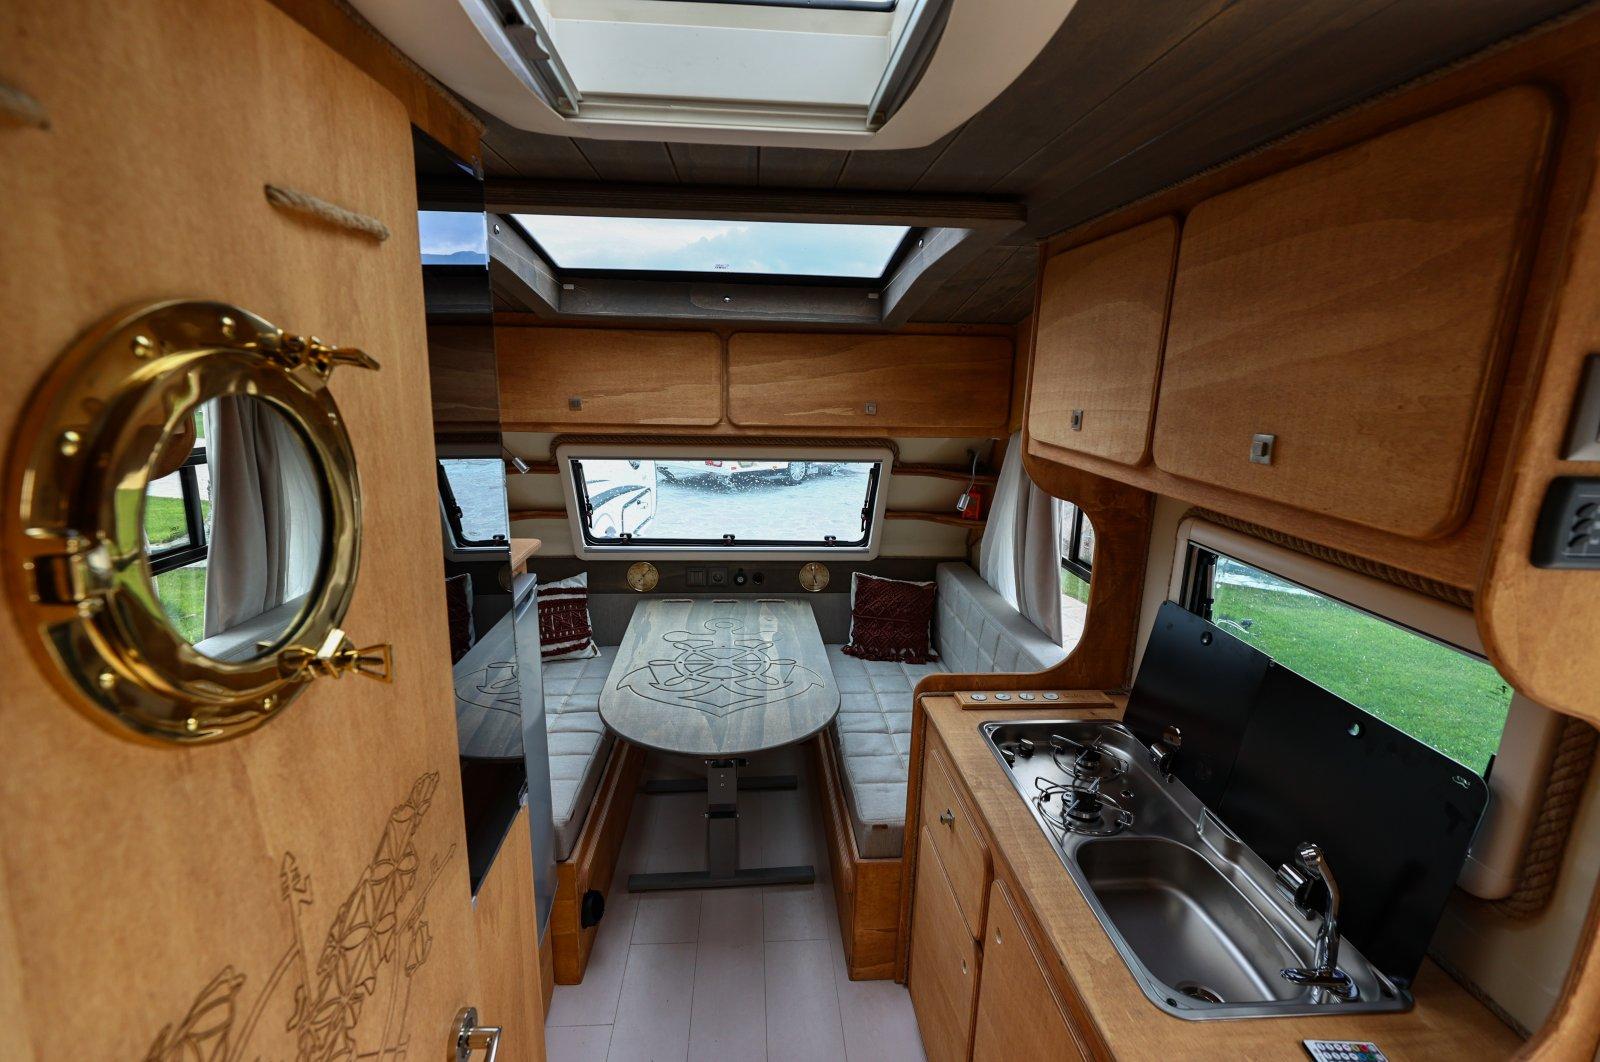 The inside of a caravan produced by Izmir-based manufacturer Ortiz Karavan, western Turkey, April 9, 2021. (AA Photo)